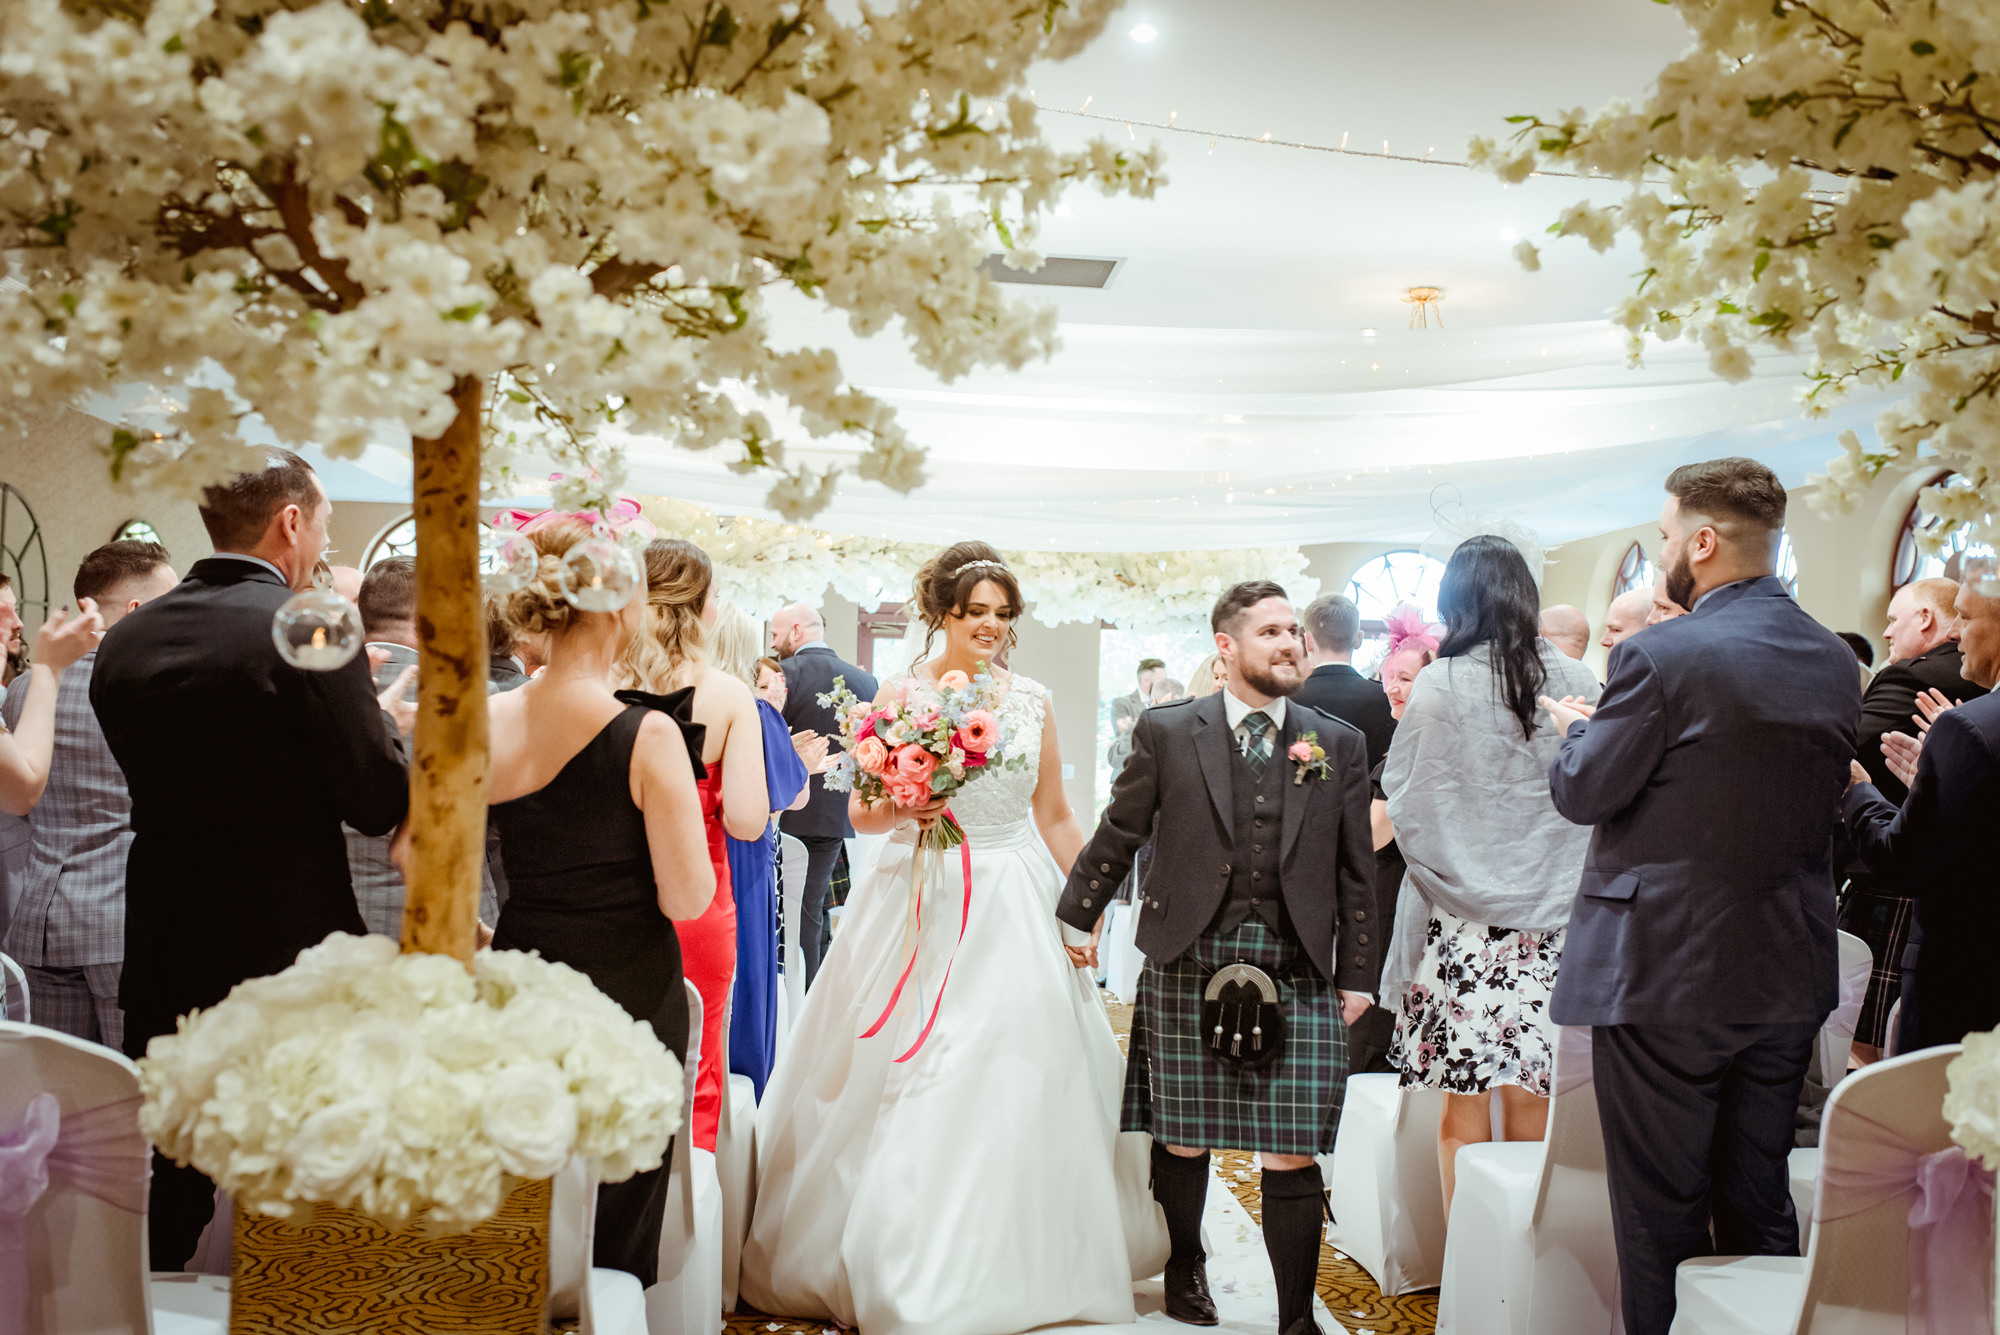 gleddoch-house-wedding.jpg